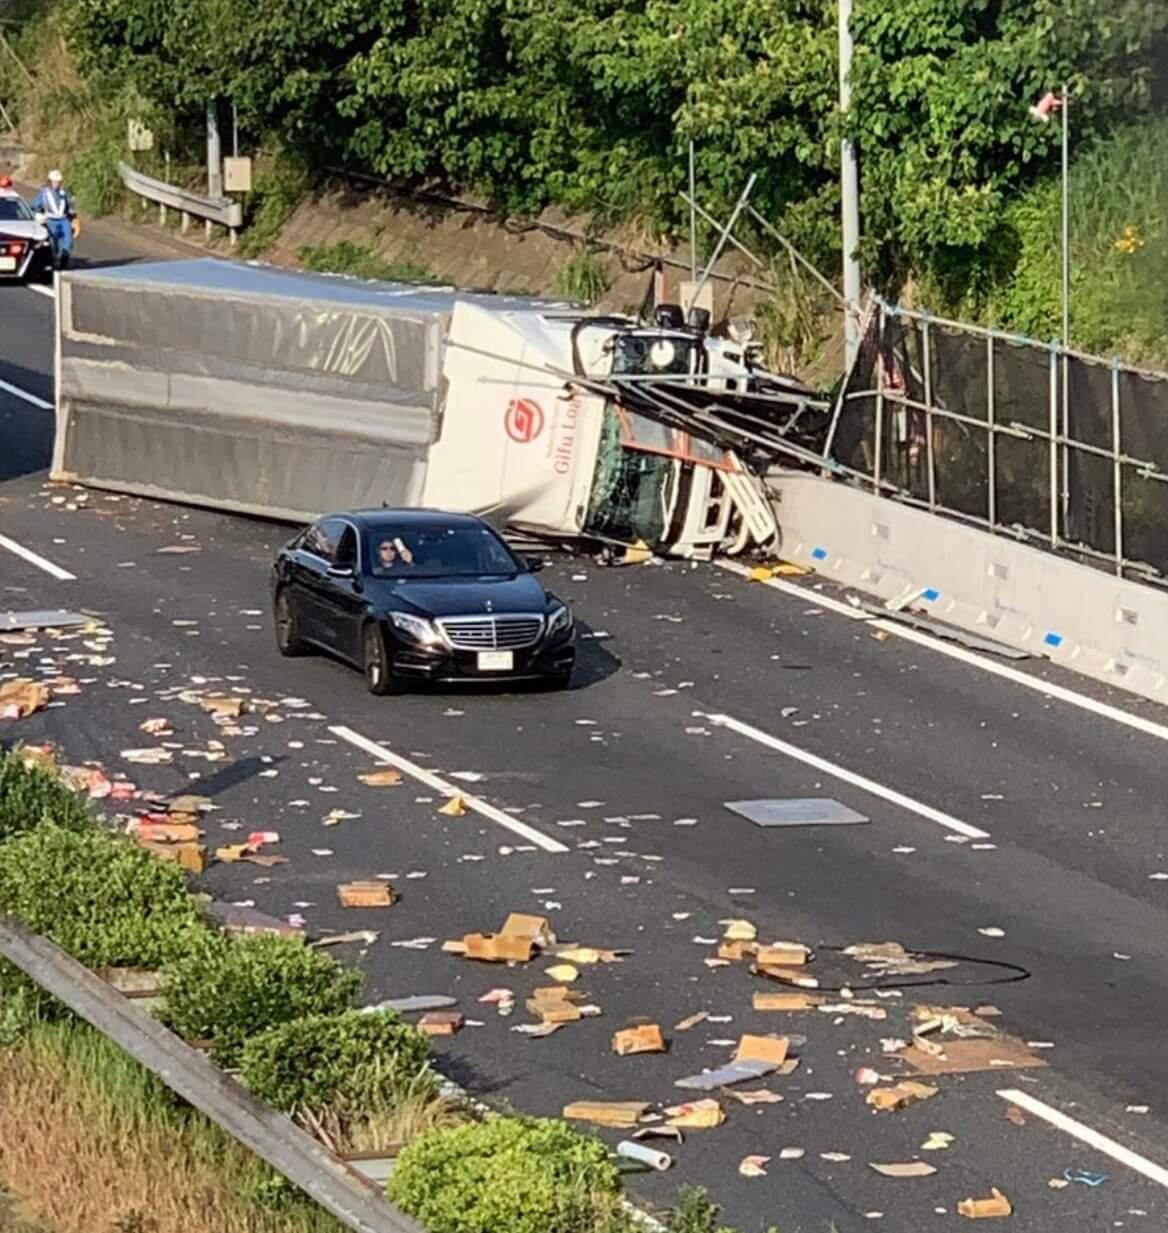 Truck accident 東名高速 海老名SA~横浜町田IC間の大和トンネル付近でトラックが横転事故